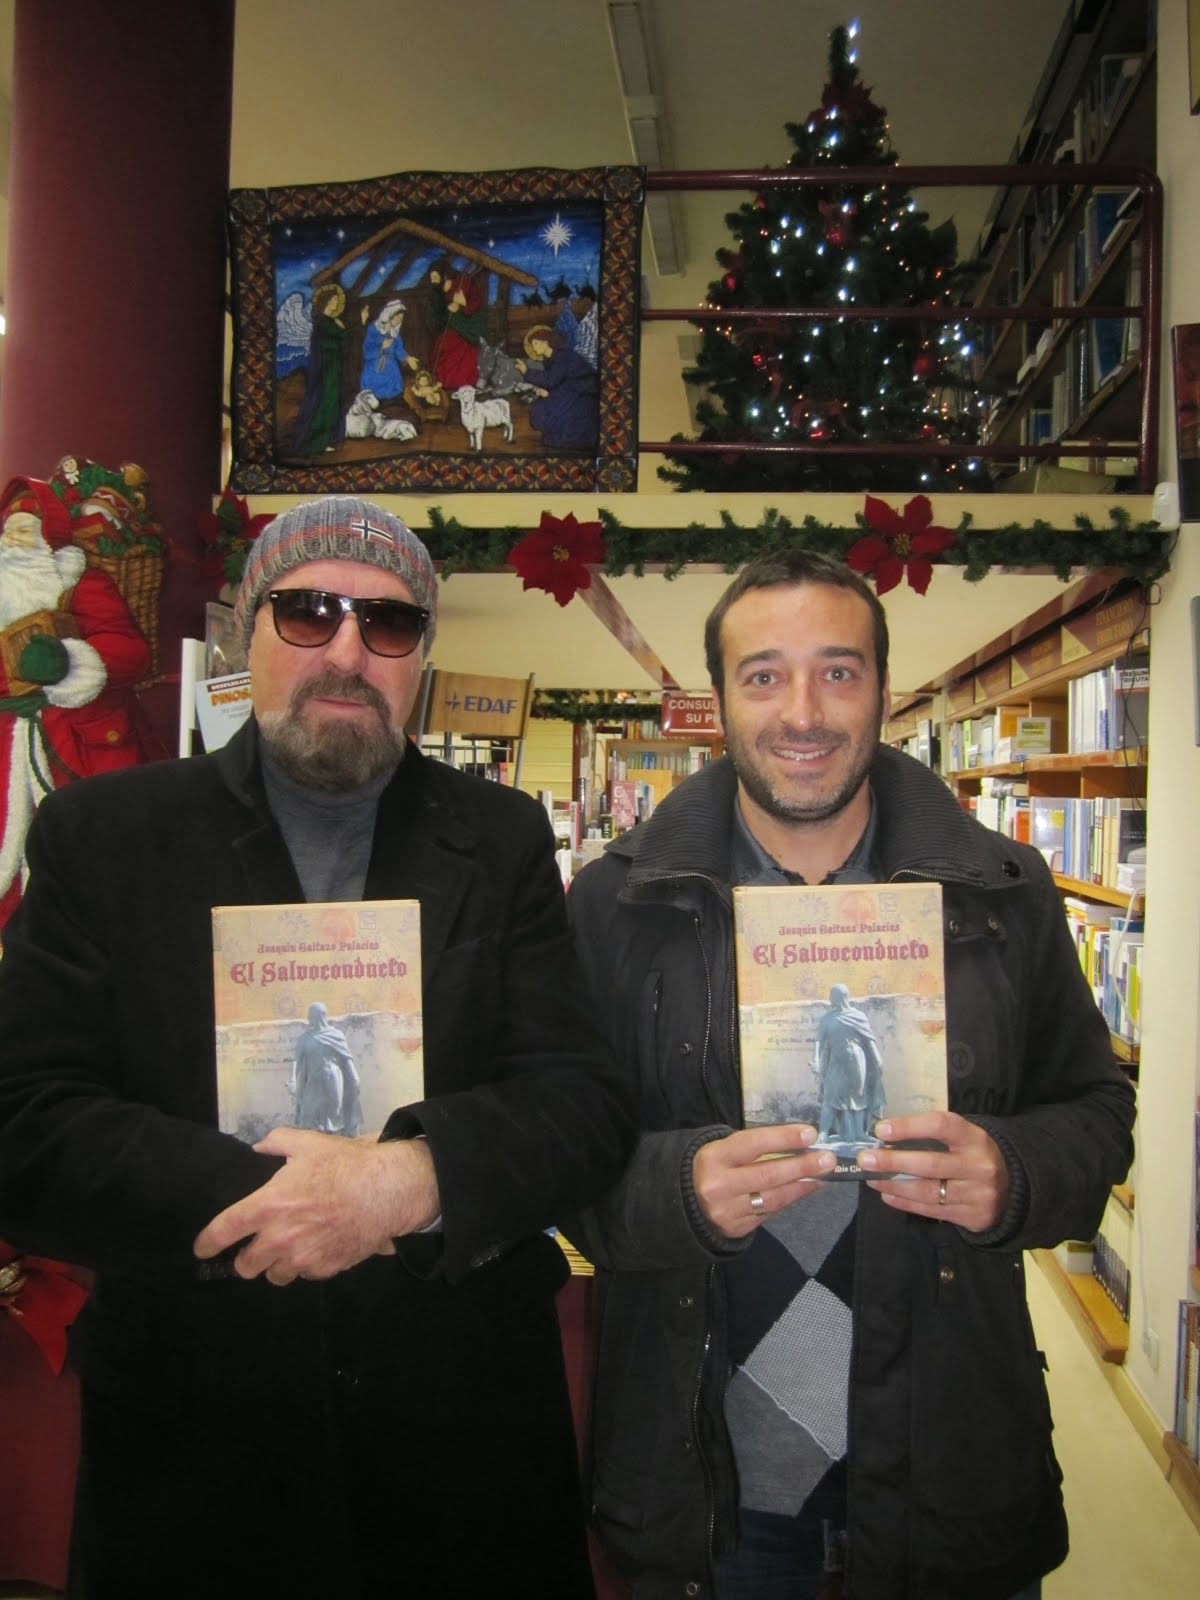 Con Mario. Librería Cilsa, Alicante.